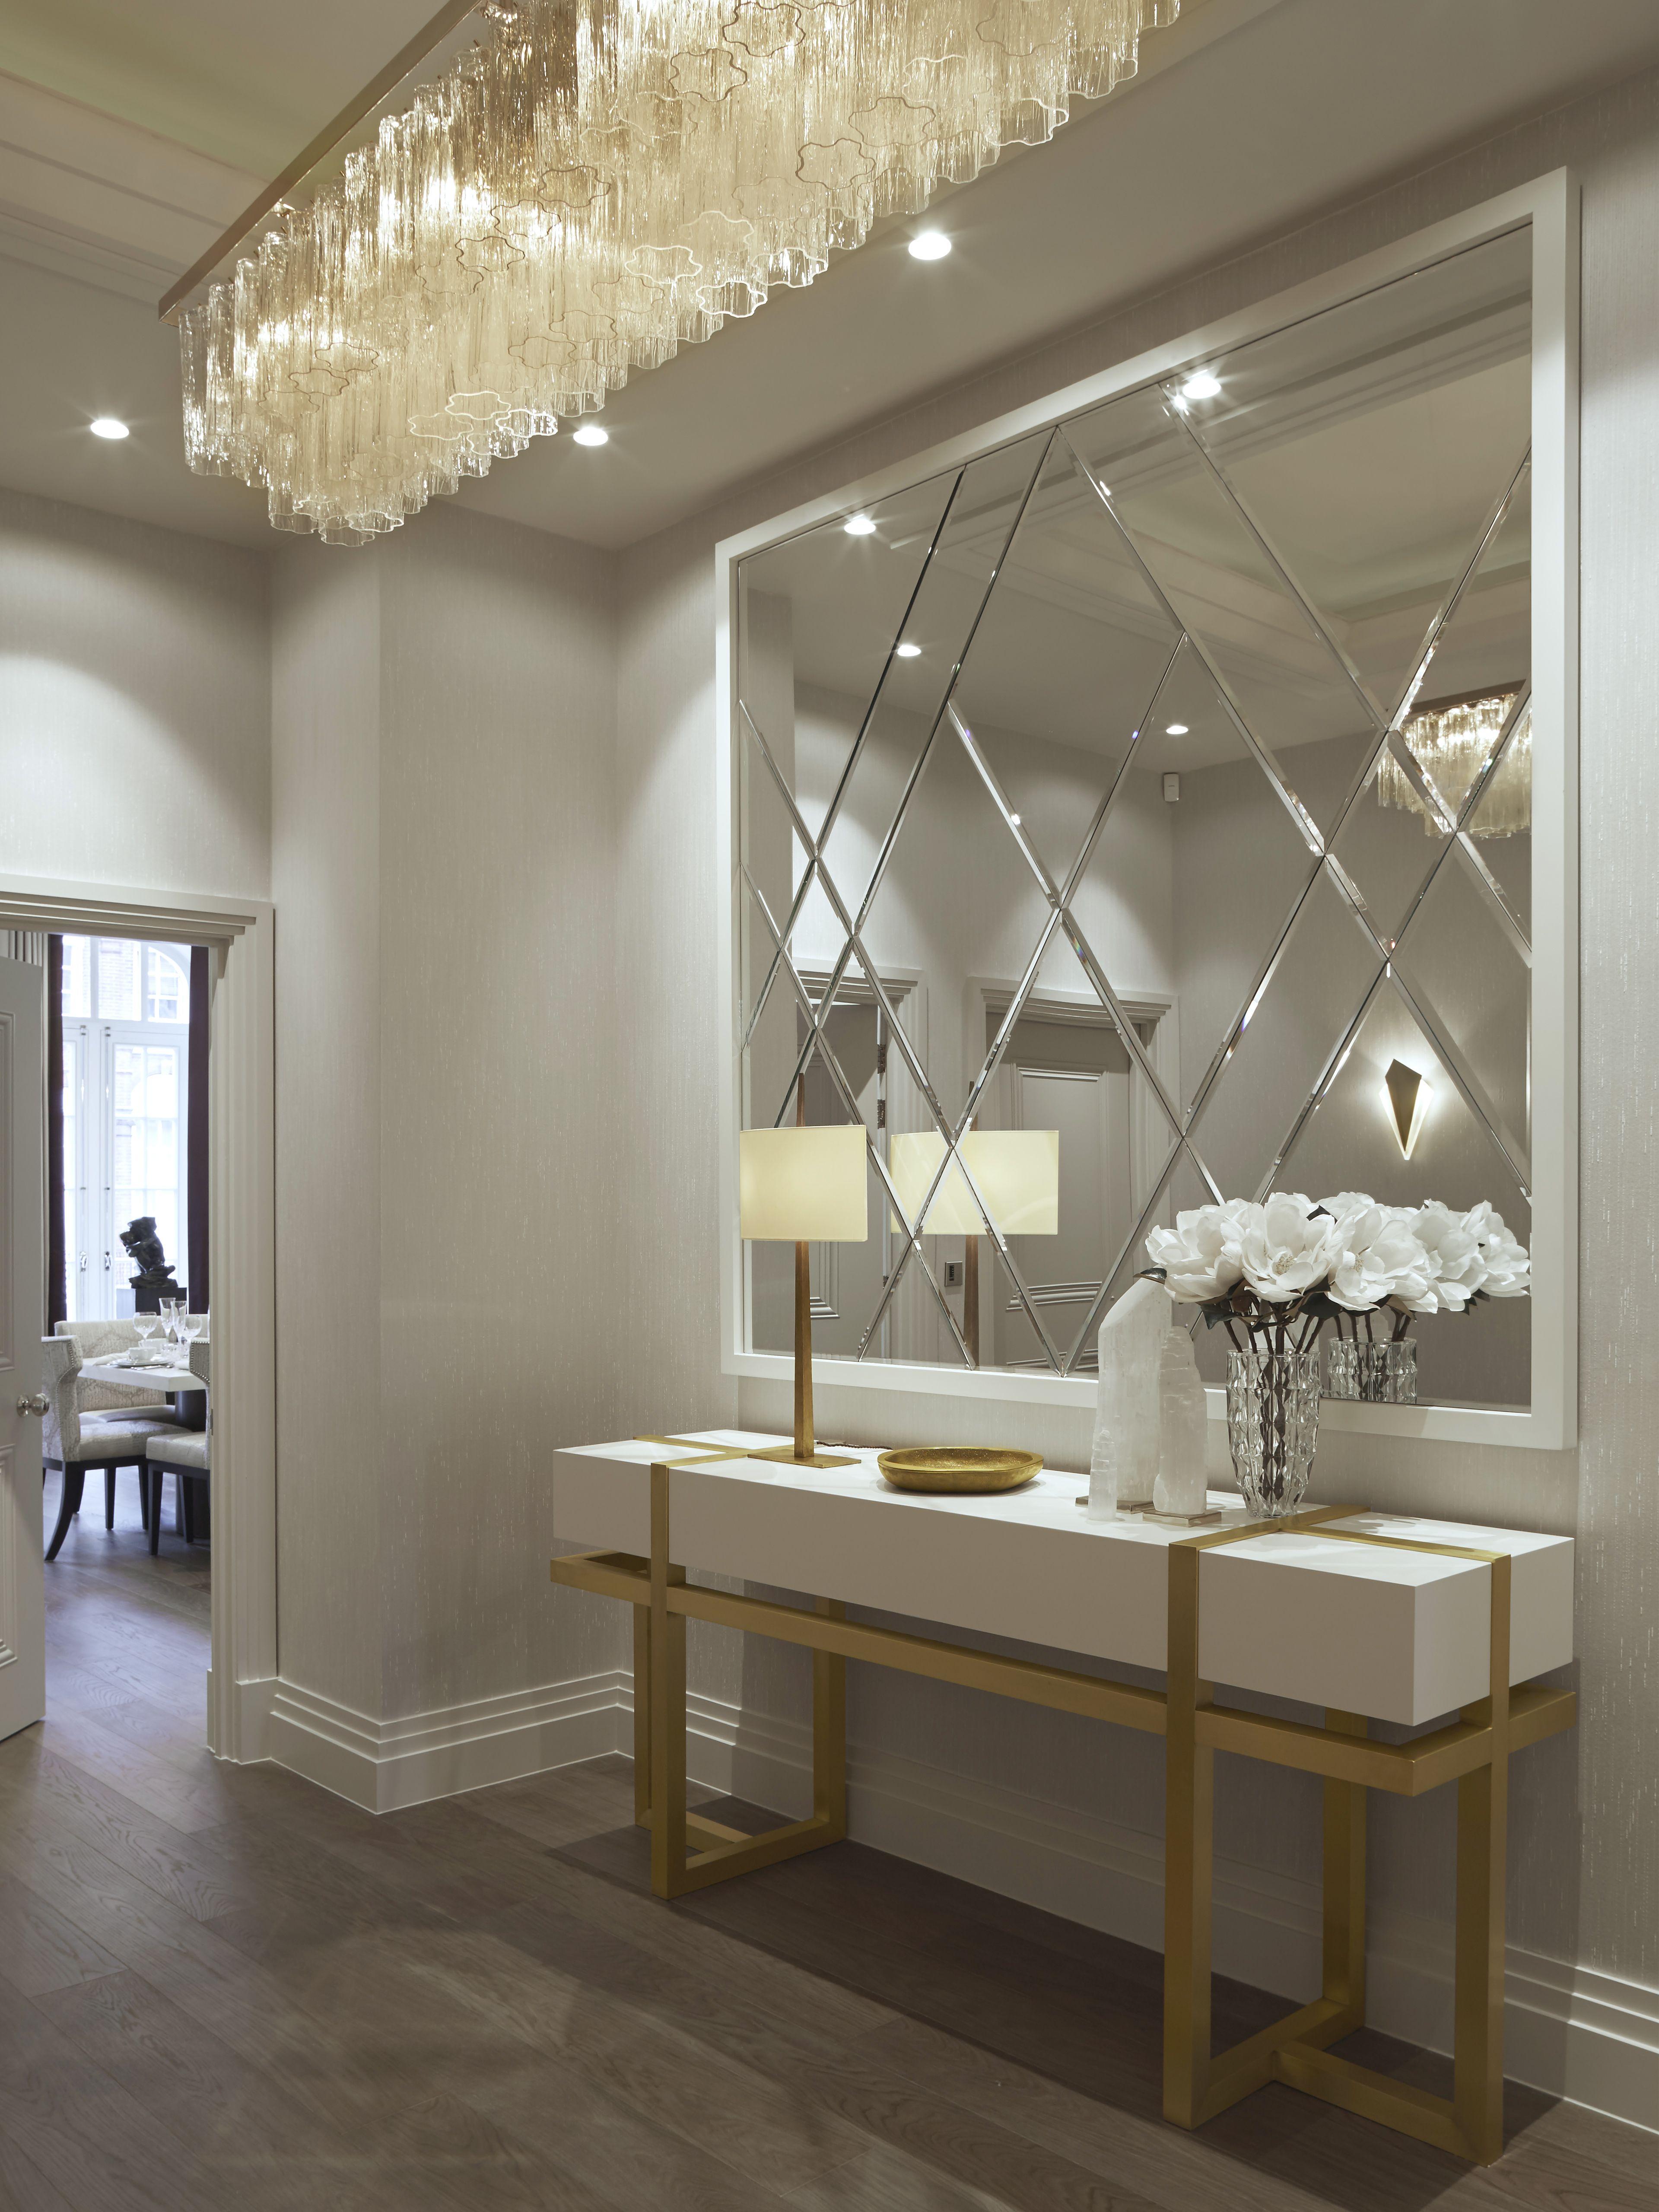 Private Knightsbridge Townhouse Living room design